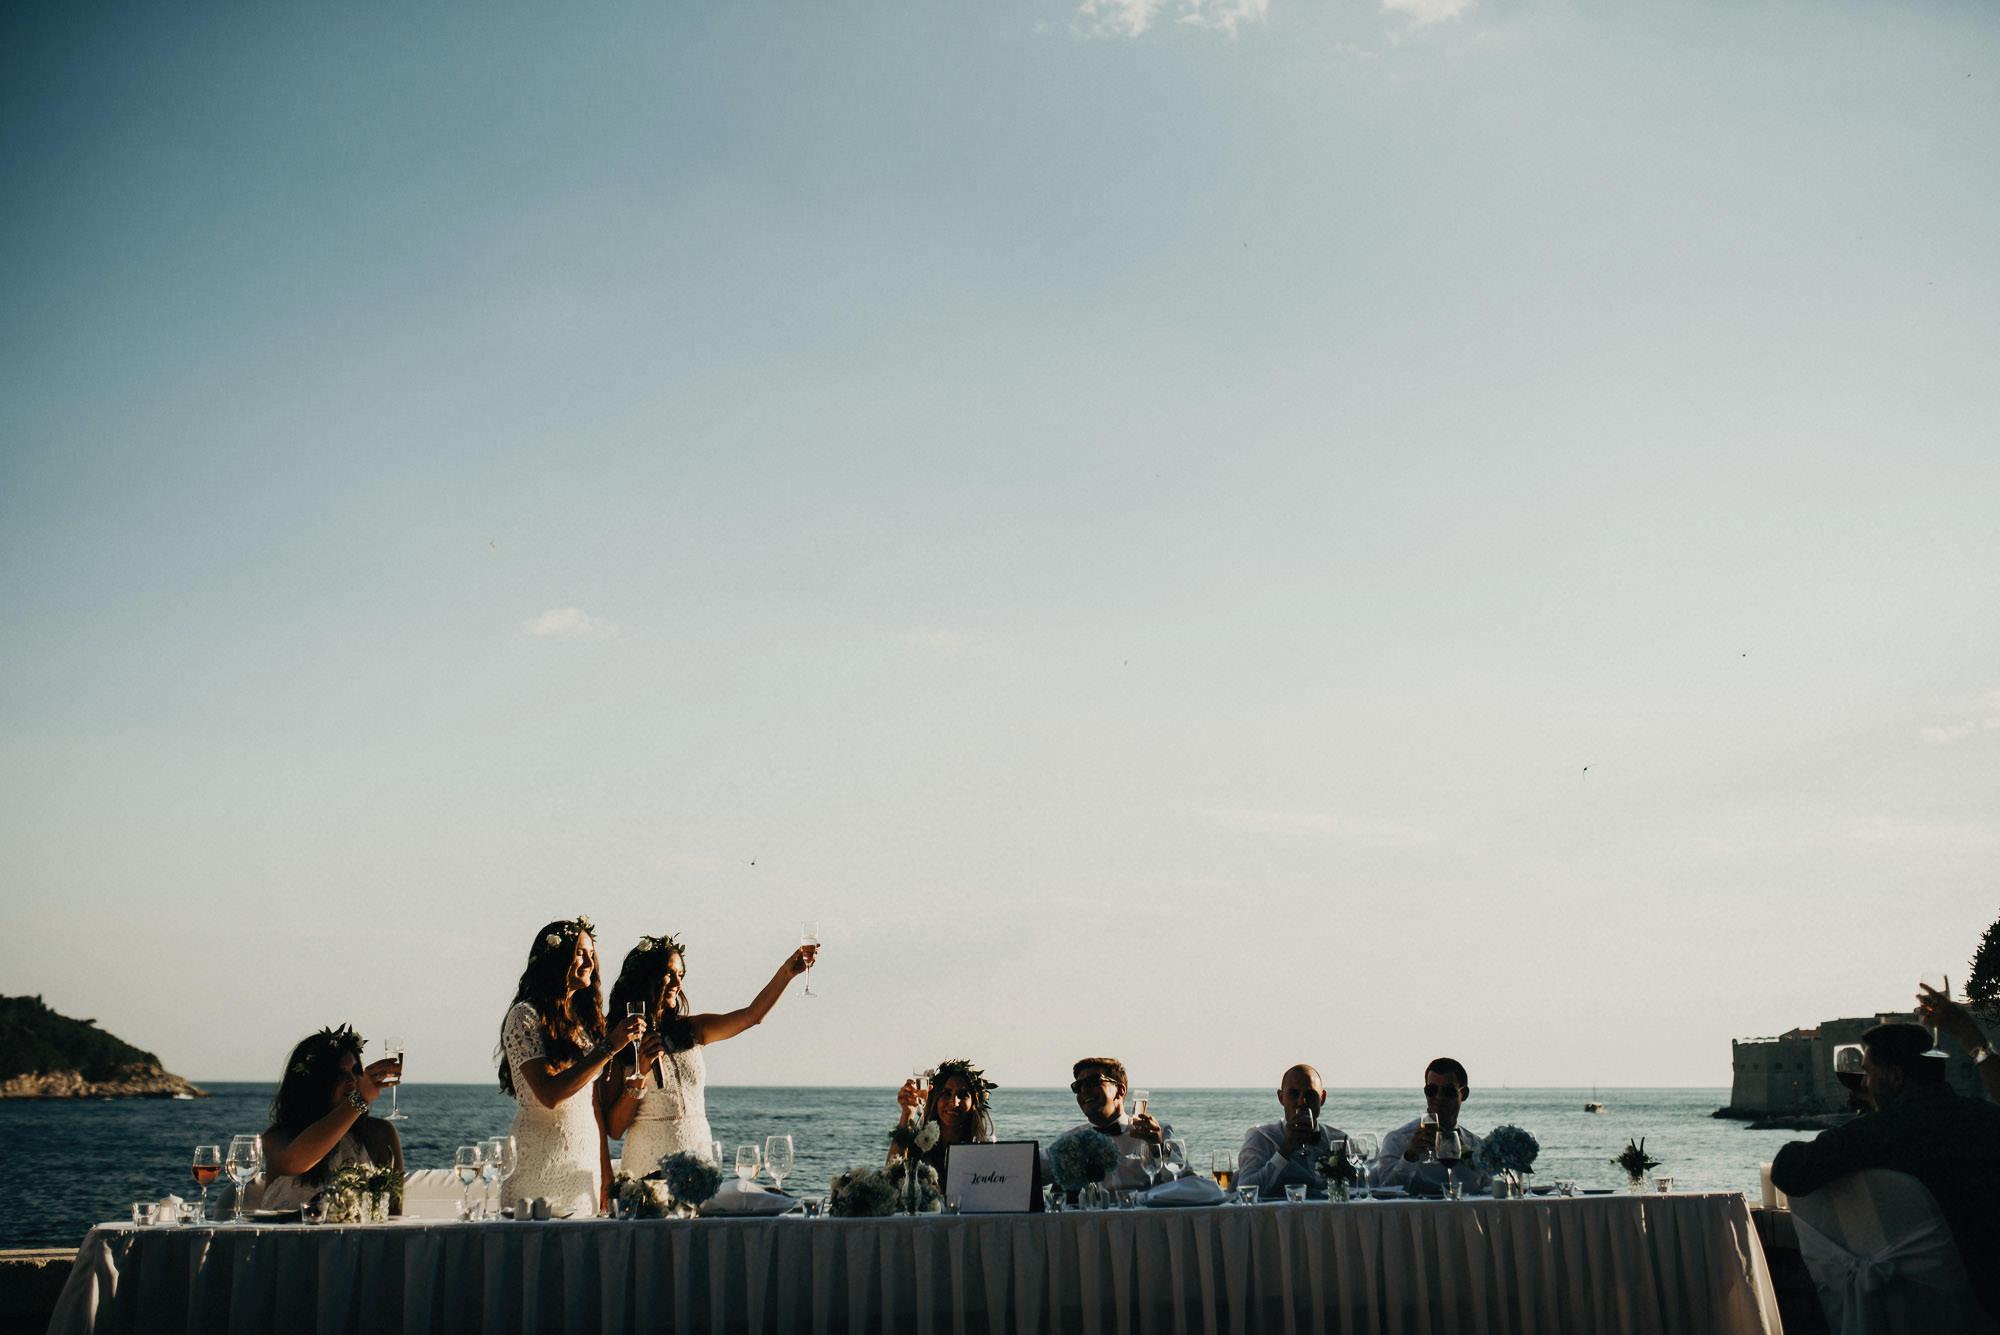 dubrovnik_croatia_wedding_photographer-jere_satamo-destination_weddings-068-web.jpg